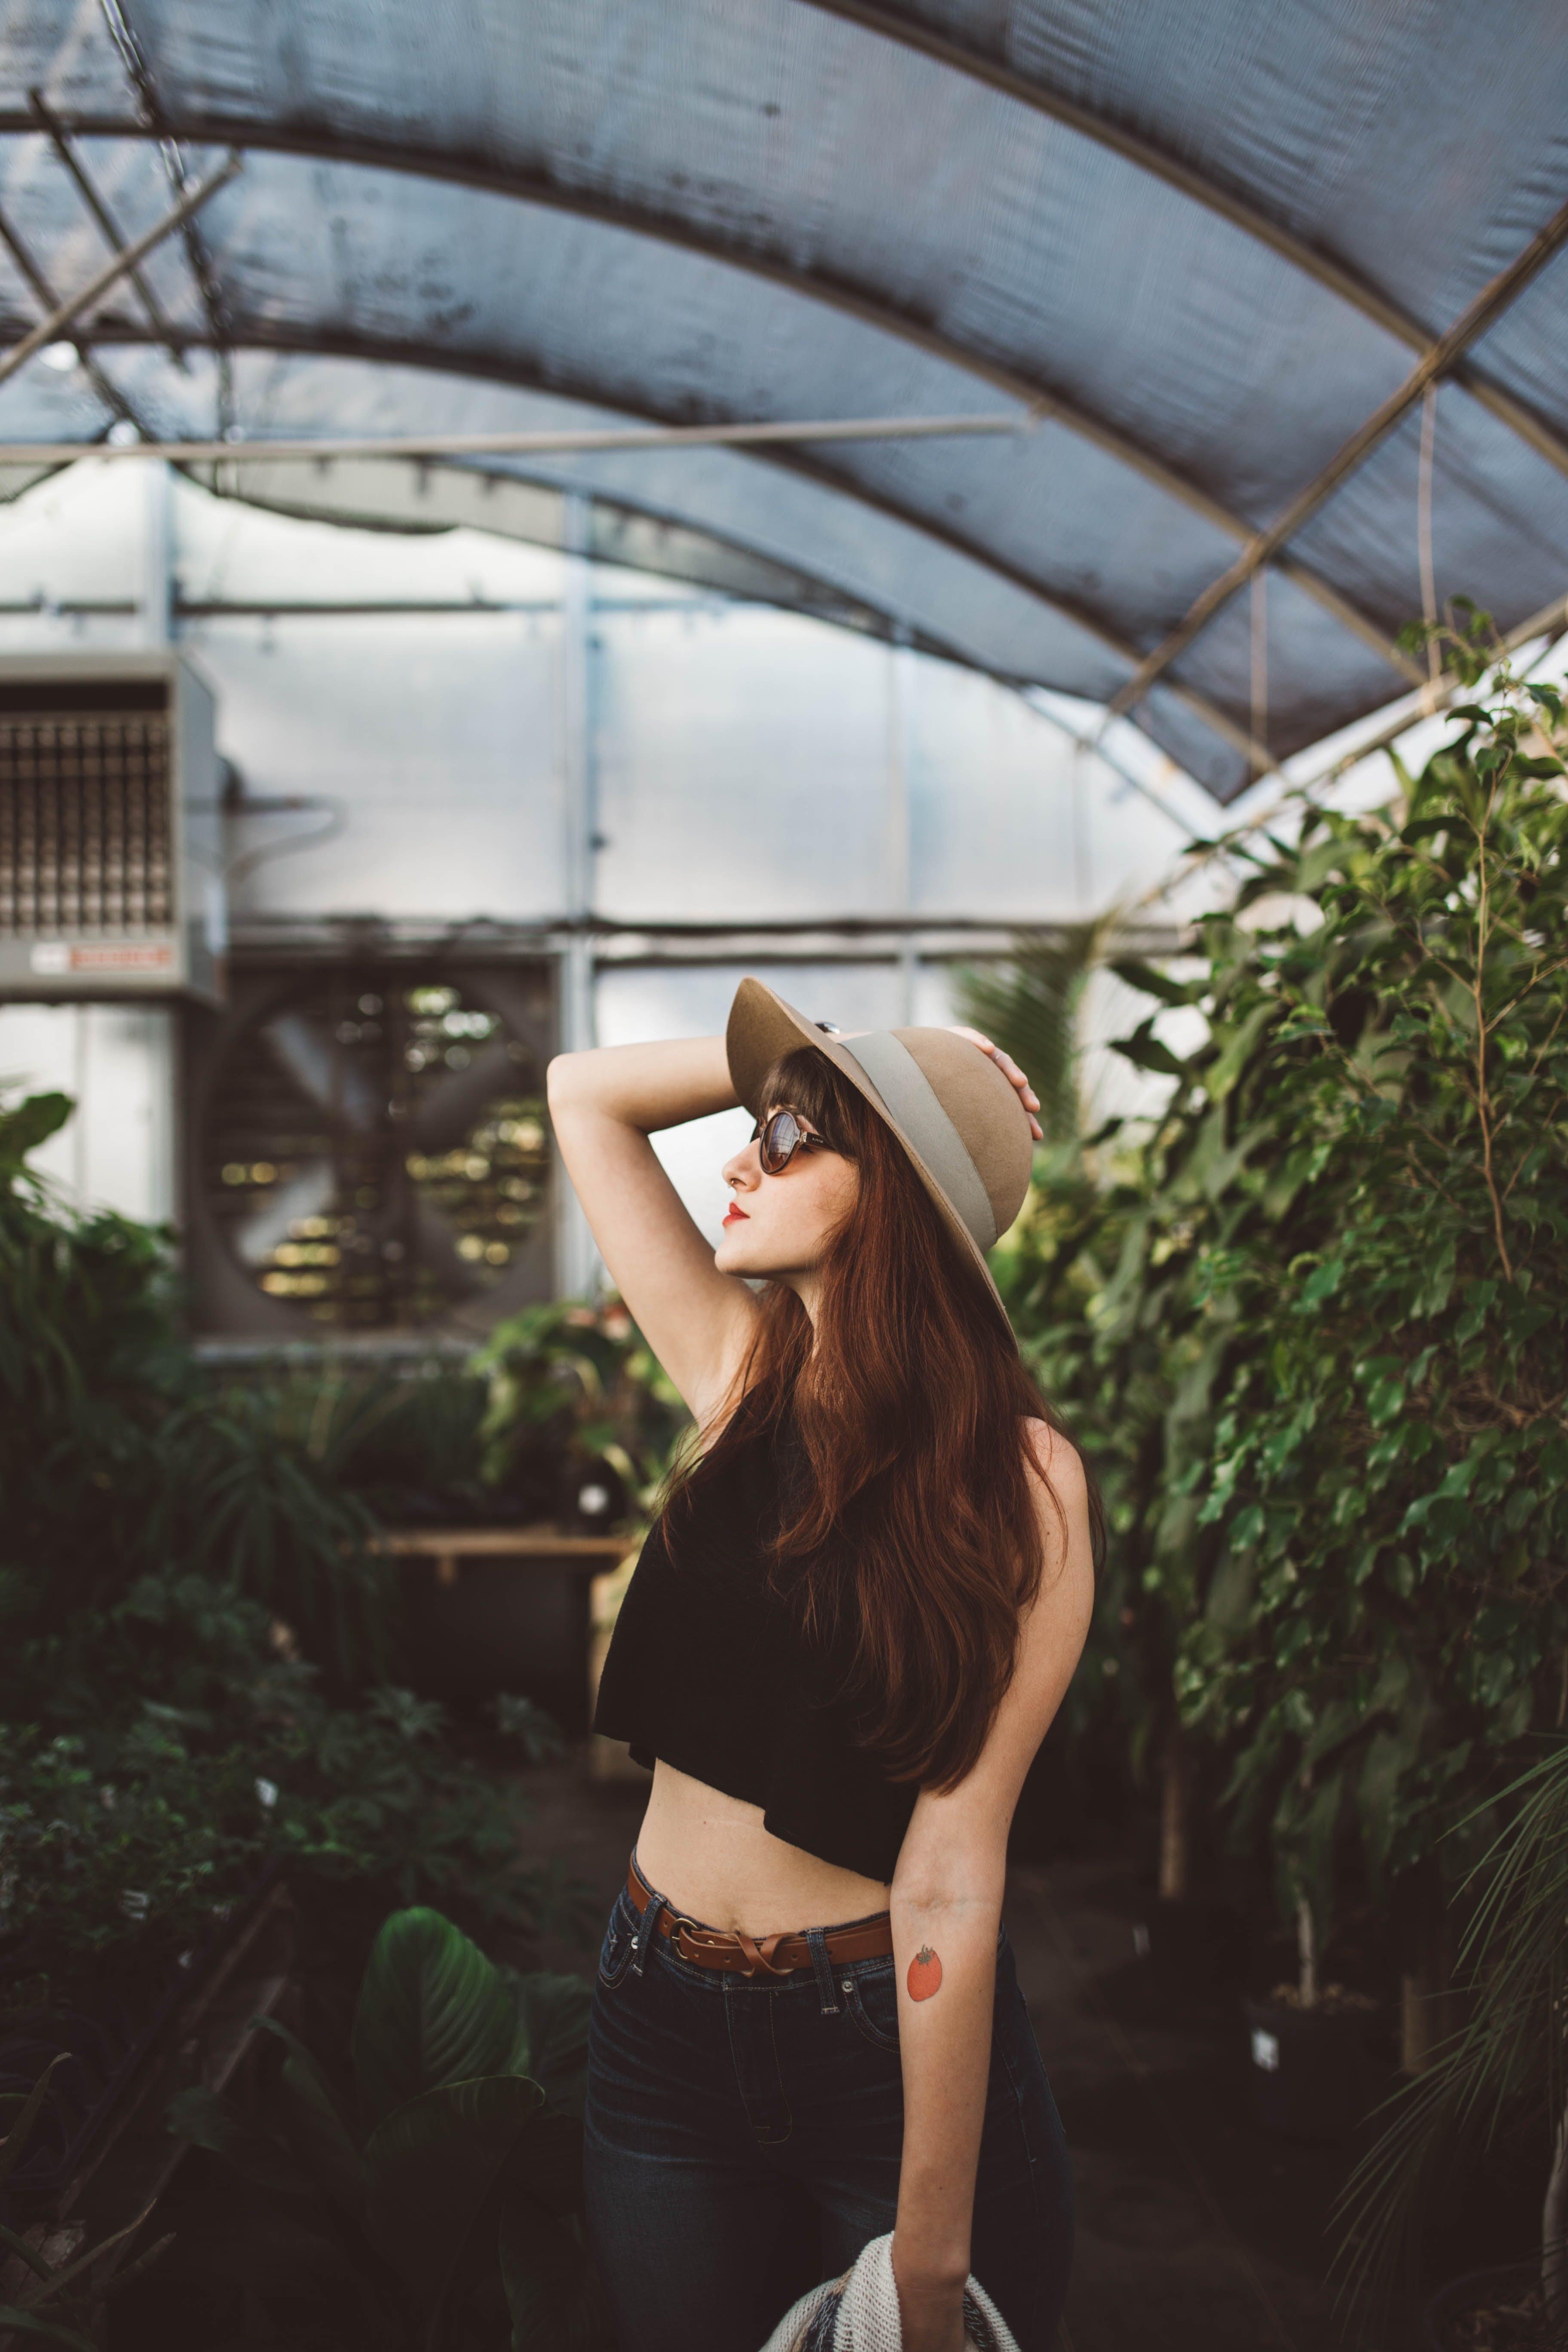 Free stock photo of woman, girl, plants, greenhouse